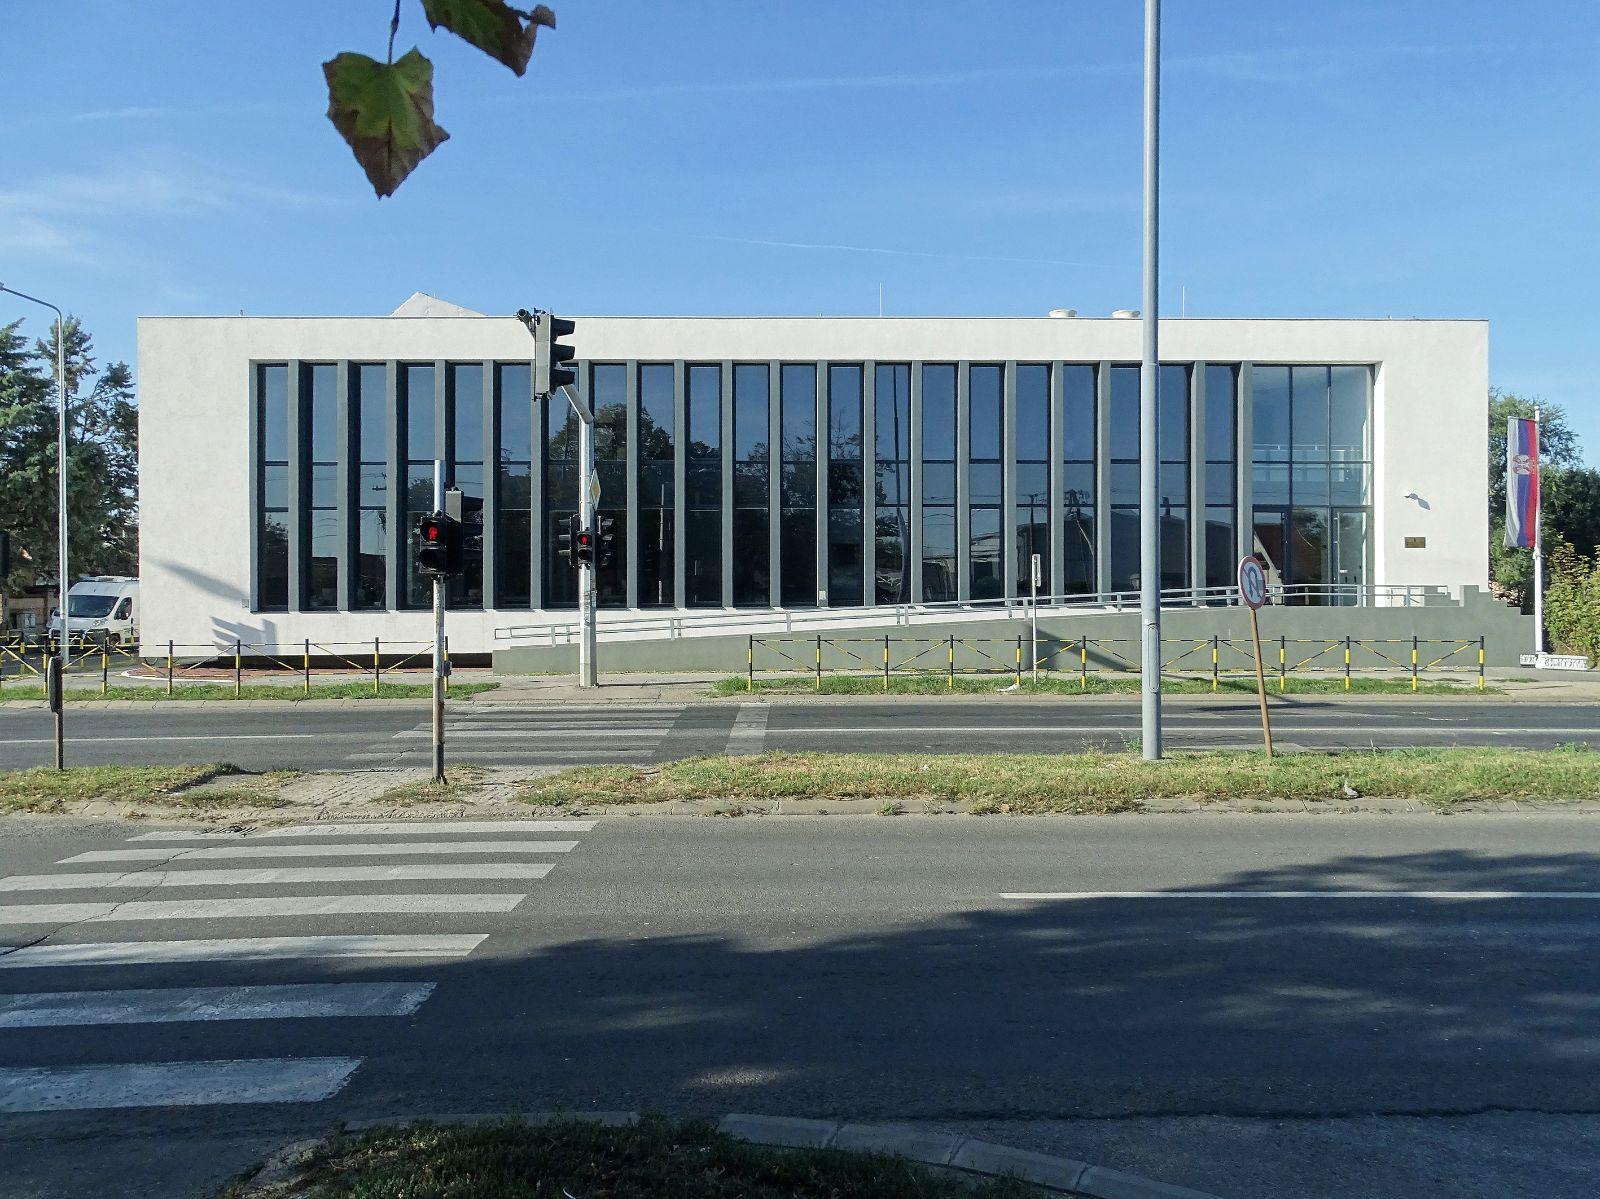 EEP: etika, estetika i politika: zgrada Prekršajnog suda u Pančevu